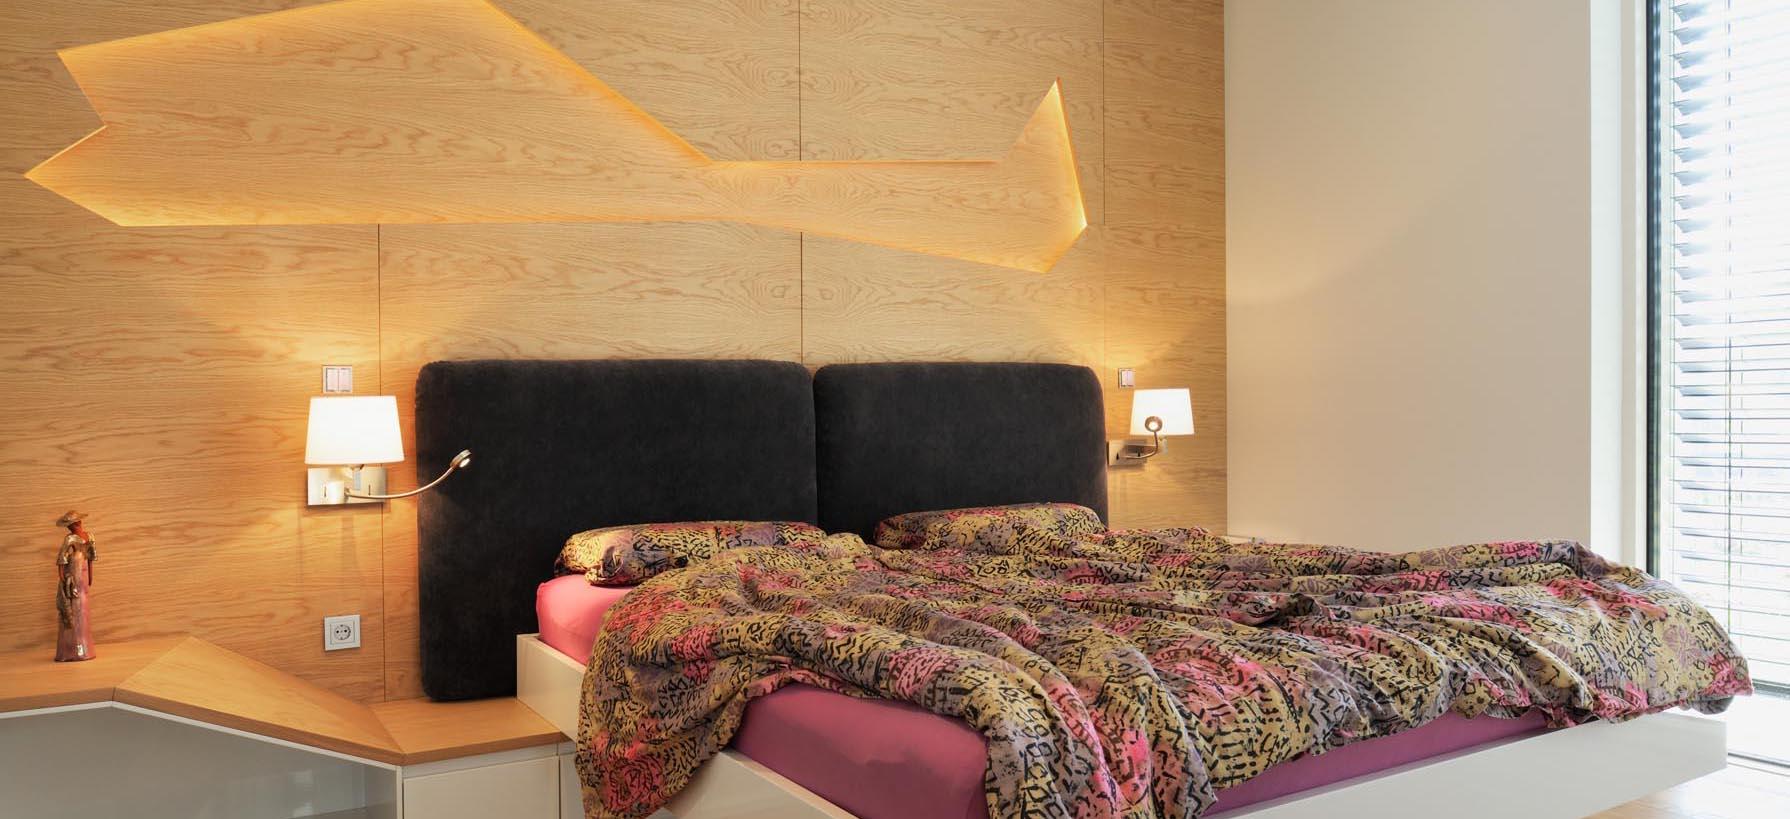 masivno leseno pohištvo